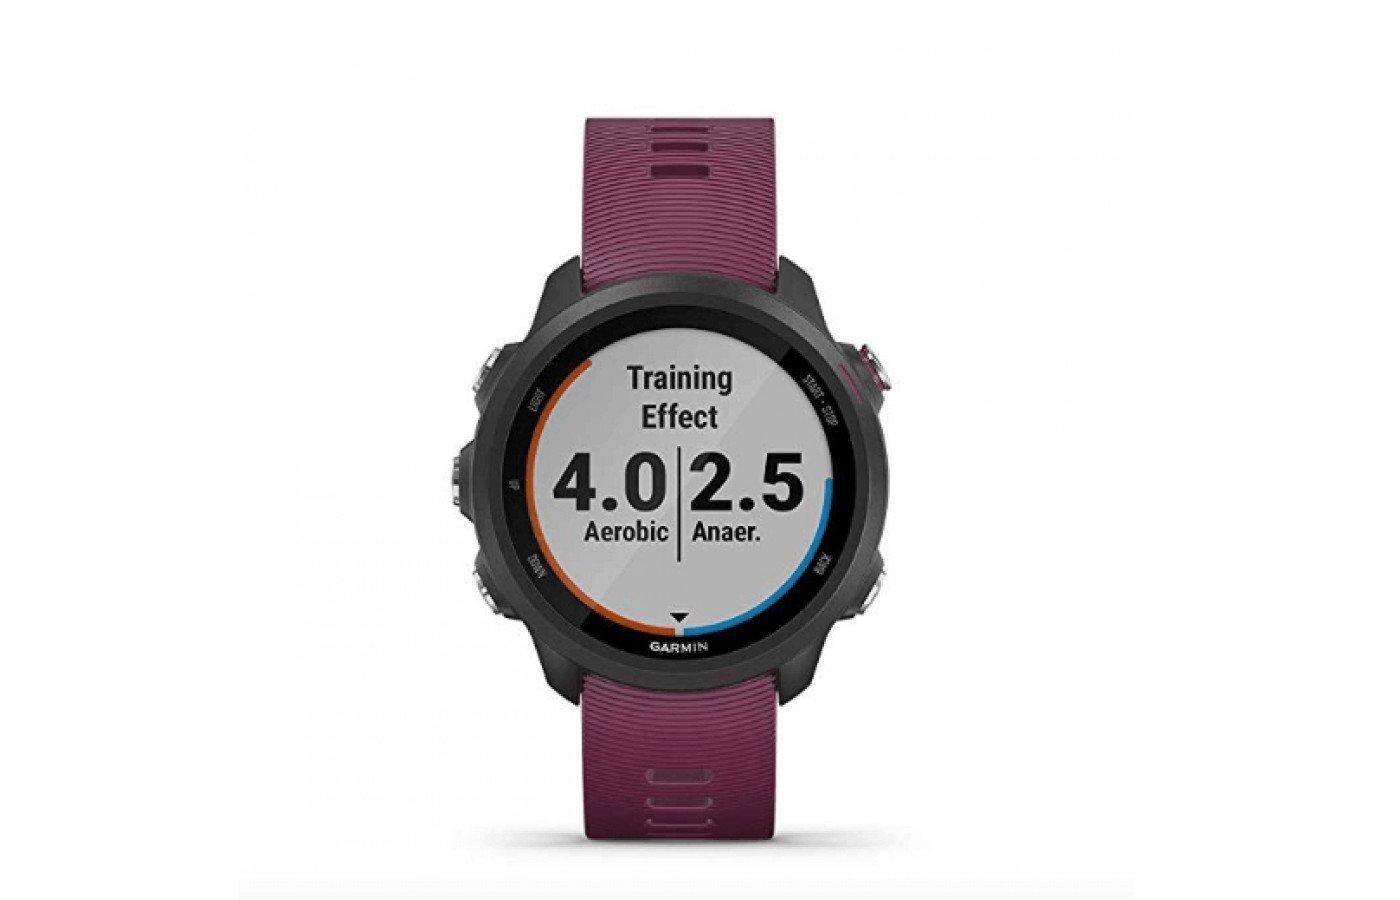 ساعت گارمين مدل forerunner 245 موجود شد